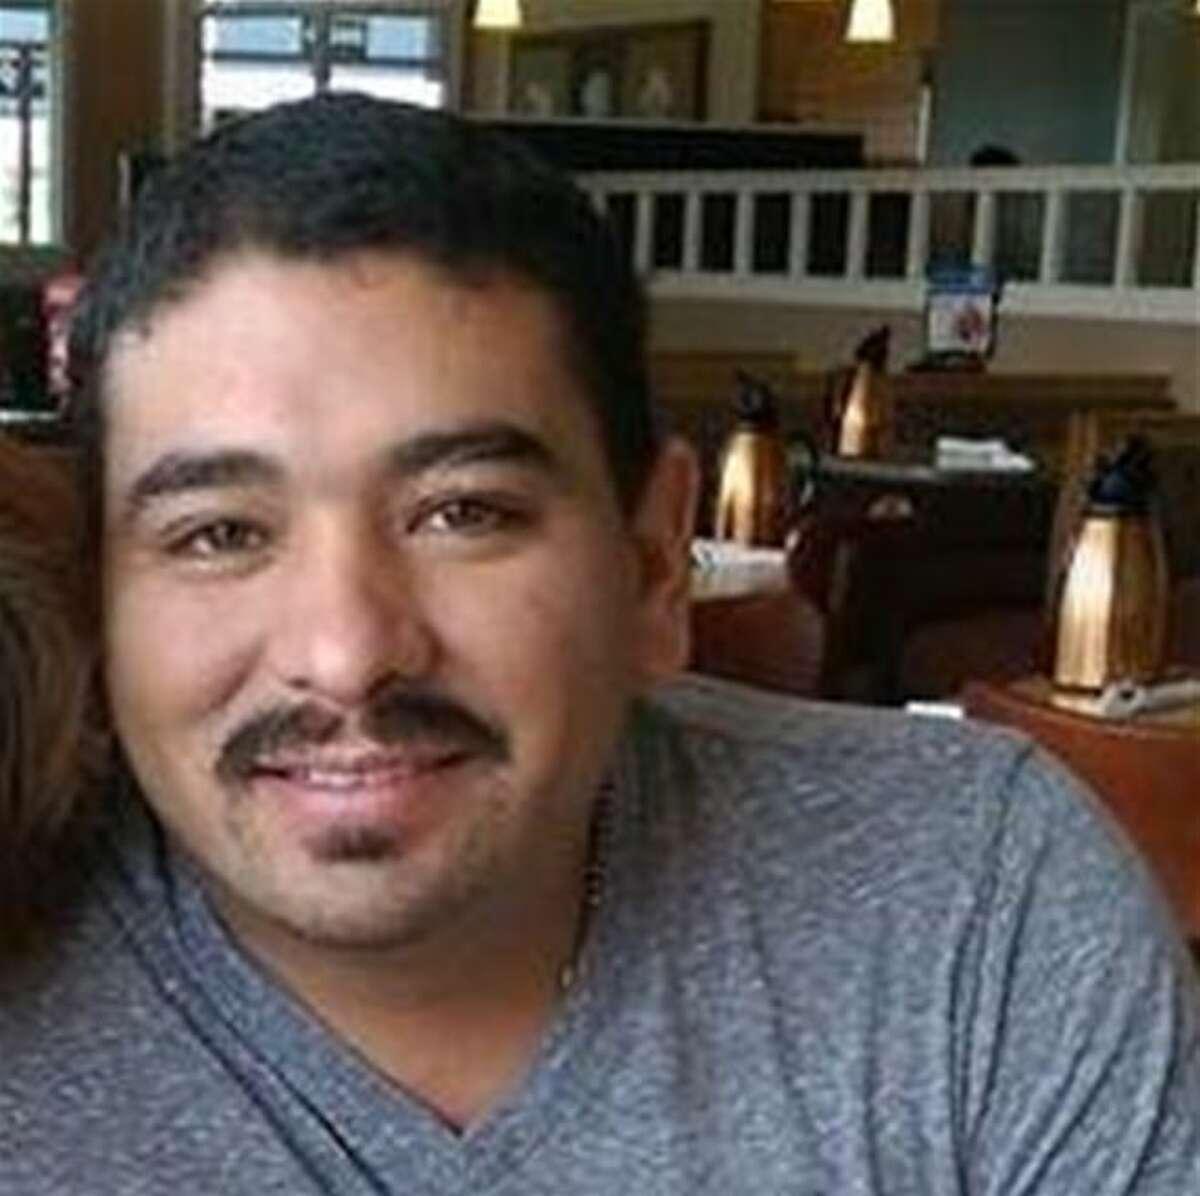 Authorities identified the man who drowned as Juan Jesus Sandoval Jr., 34.